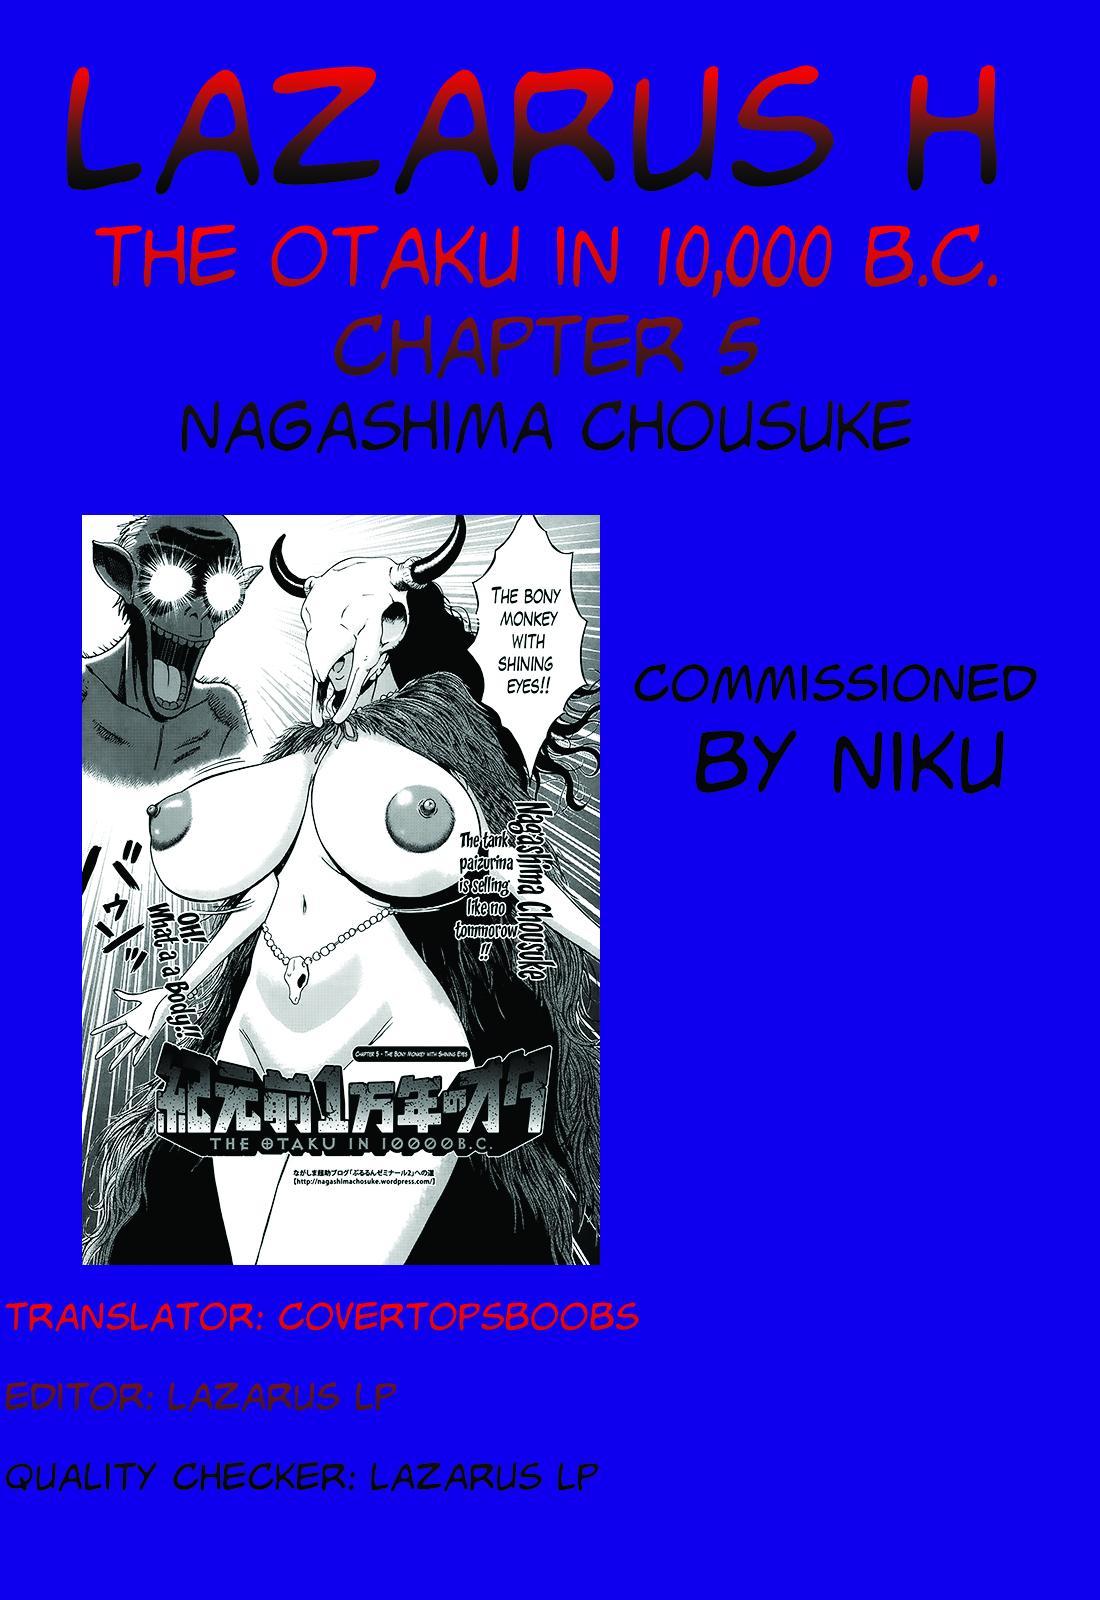 Kigenzen 10000 Nen no Ota   The Otaku in 10,000 B.C. Ch. 1-6 98